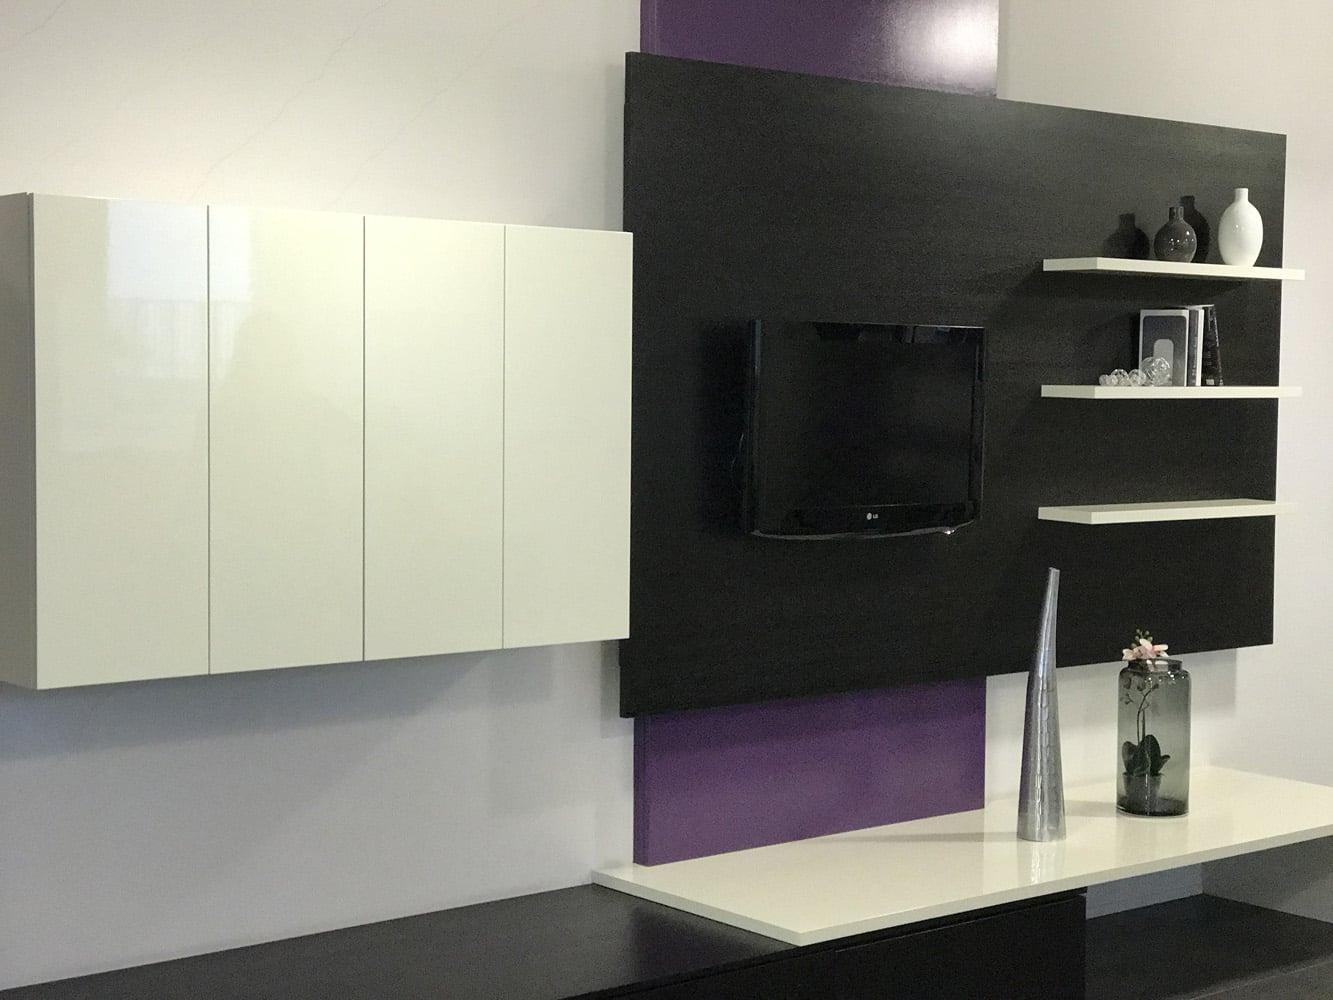 soldes sur les dressing et agencement d exposition apf menuiserie sa. Black Bedroom Furniture Sets. Home Design Ideas